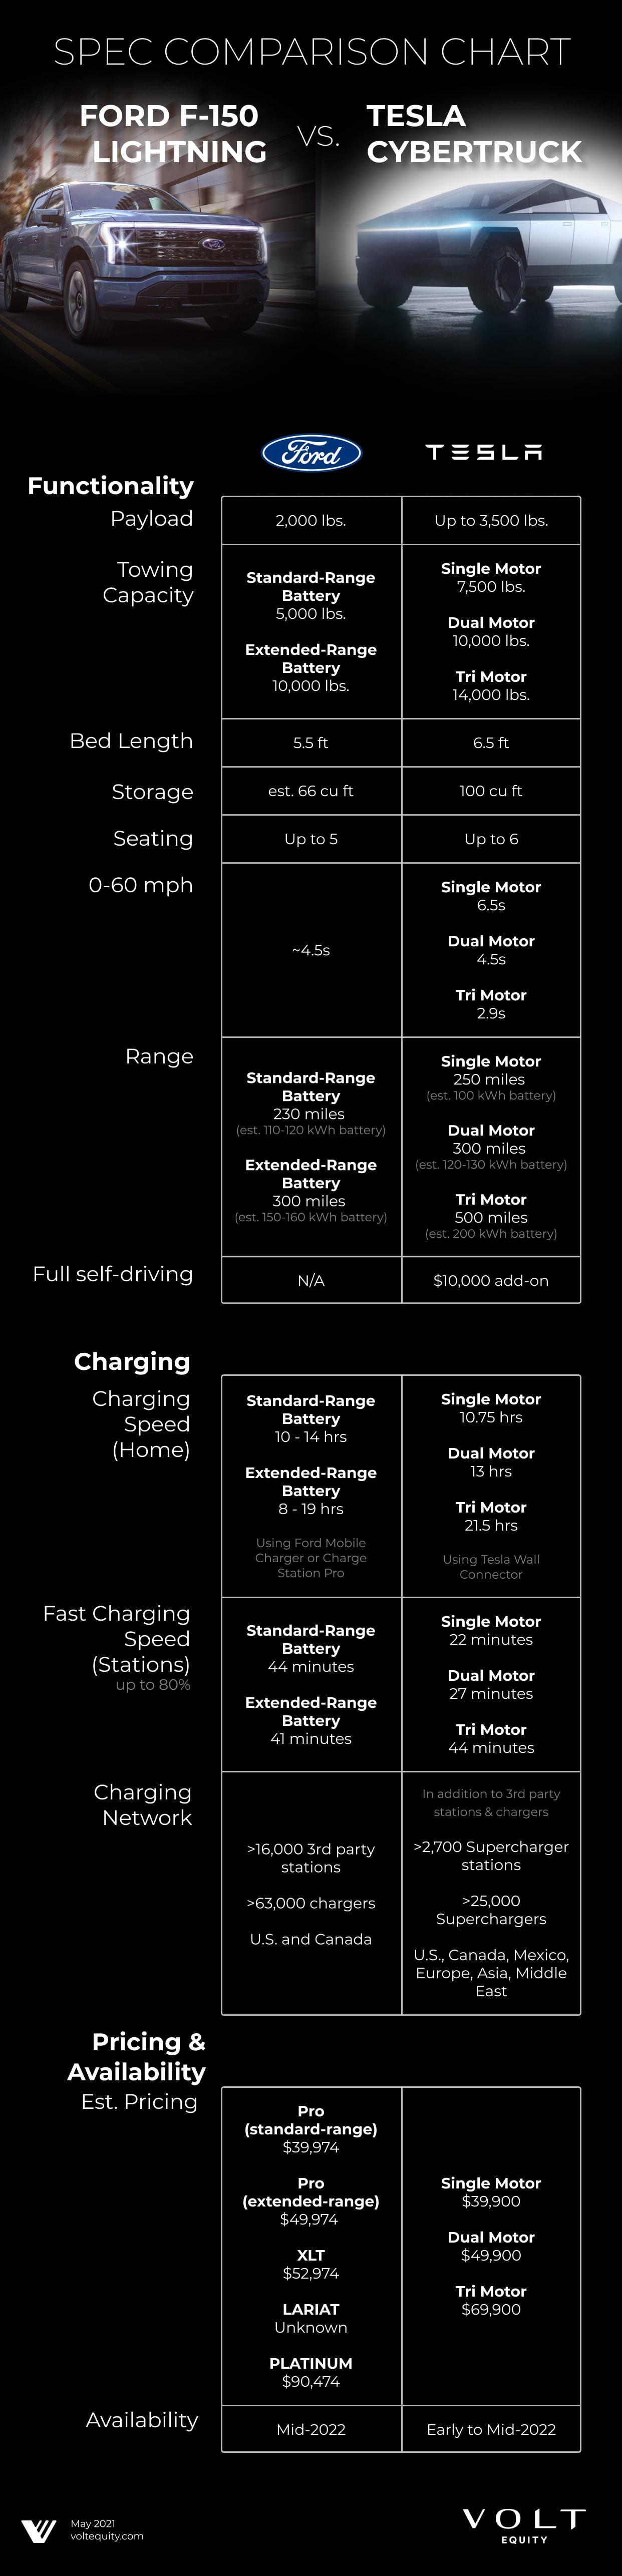 Ford F-150 Lightning vs. Tesla Cybertruck Comparison Chart